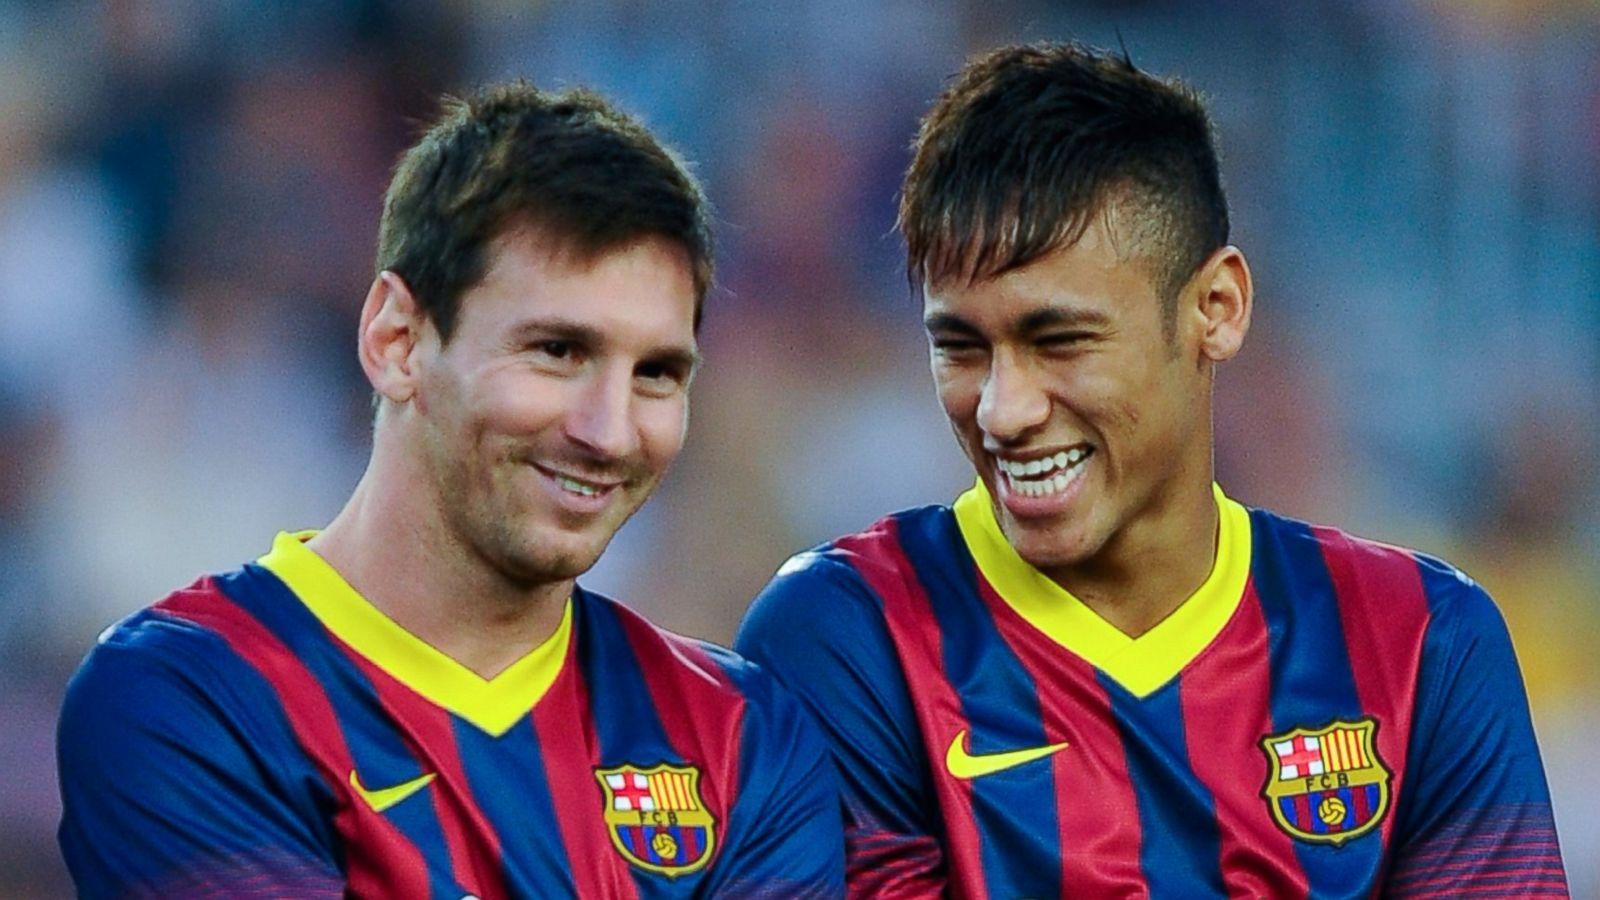 FunMozar Lionel Messi Wallpapers 1600x900